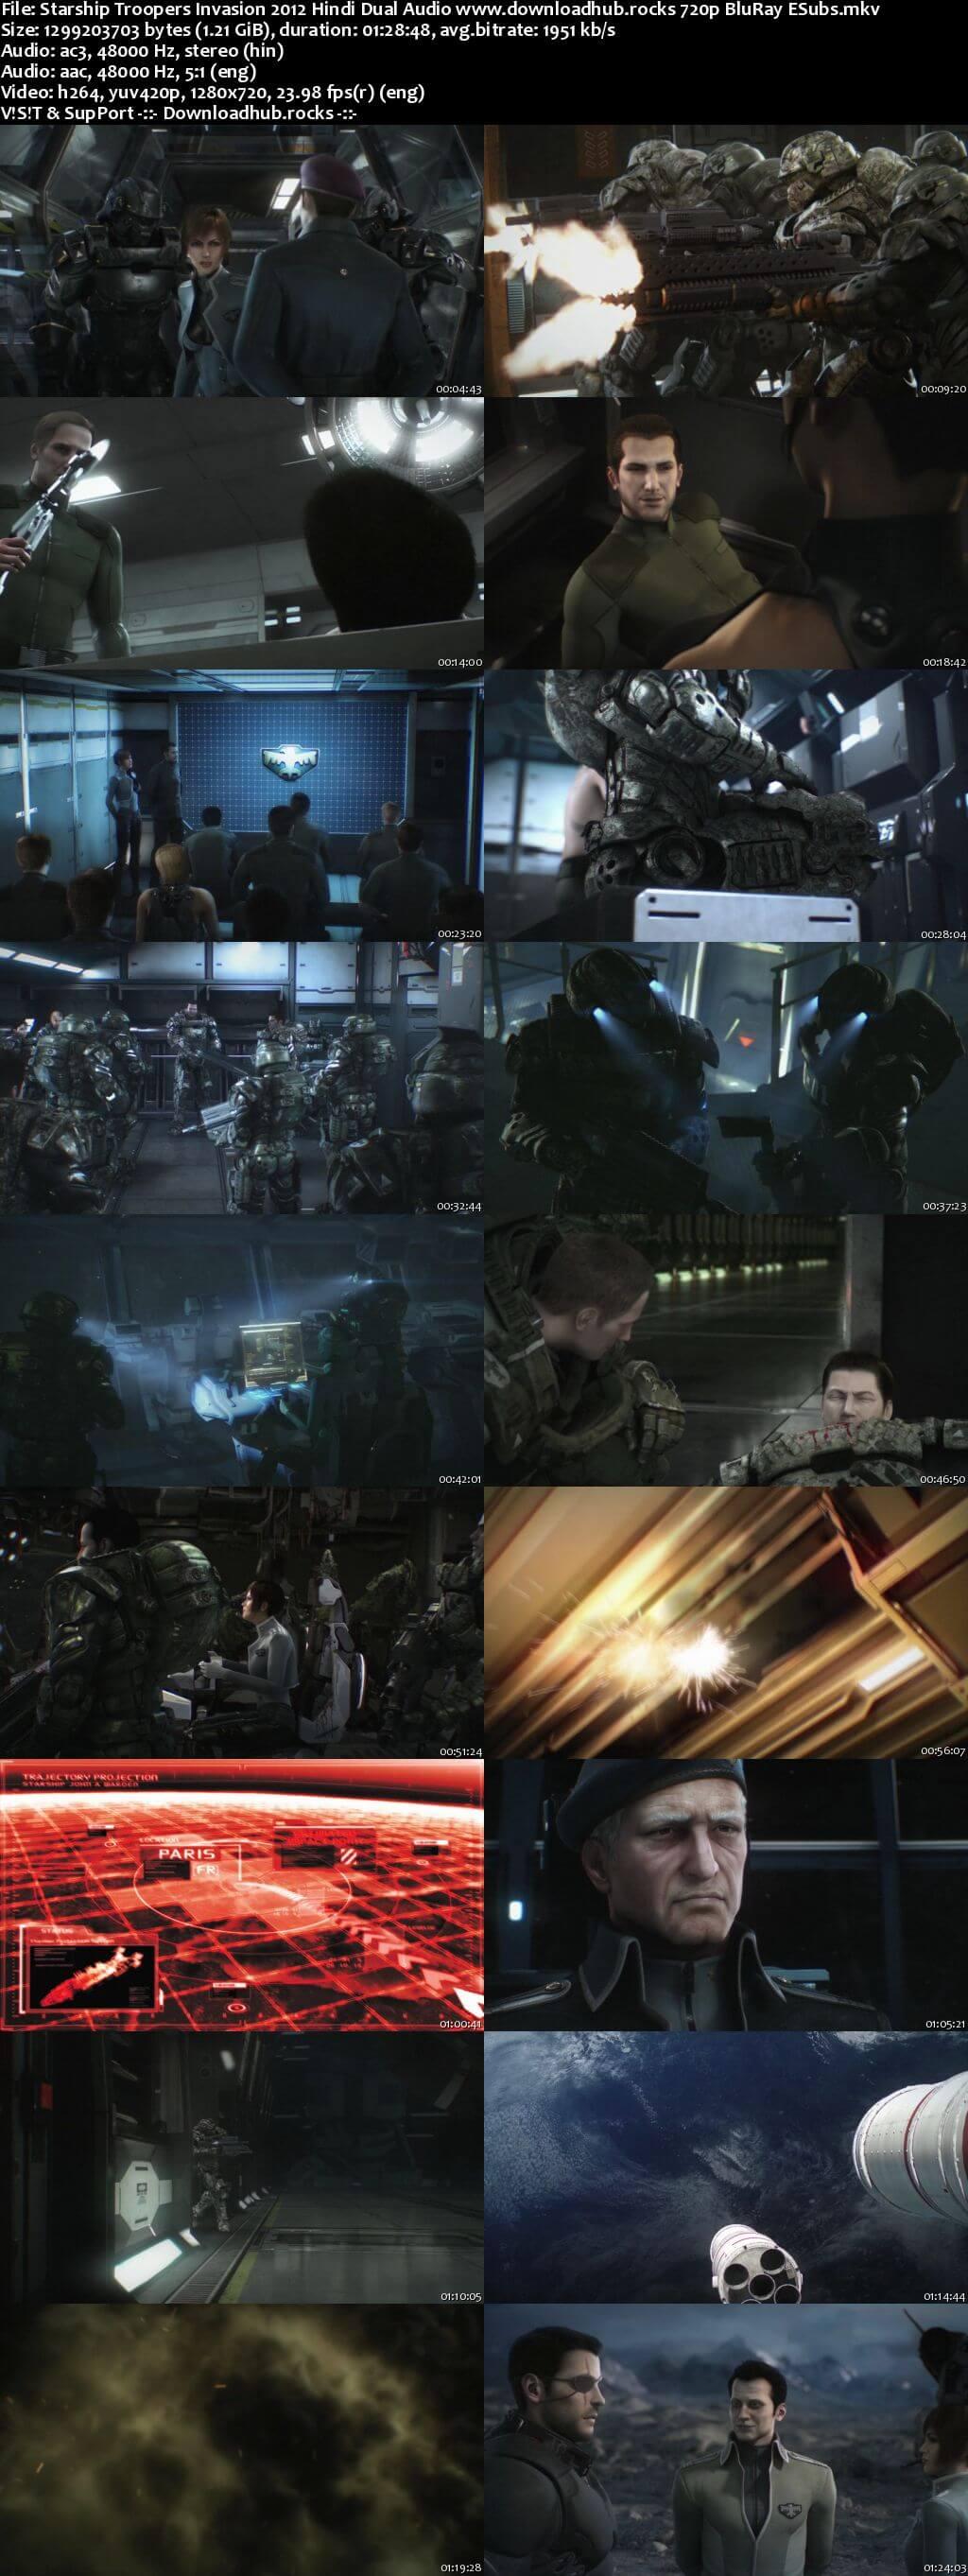 Starship Troopers Invasion 2012 Hindi Dual Audio 720p BluRay ESubs